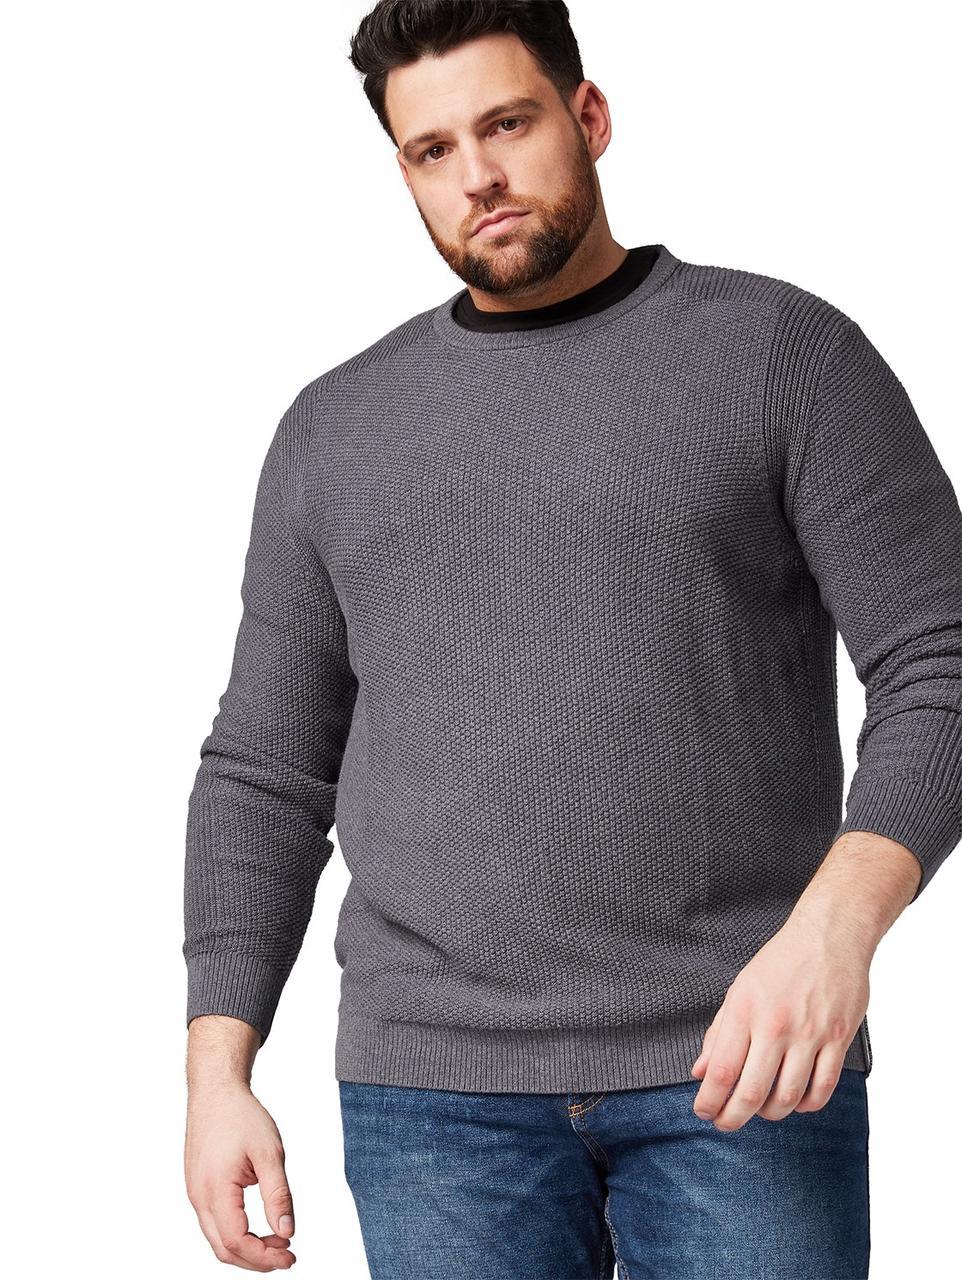 Джемпер Tom Tailor 1007499 3XL Серый